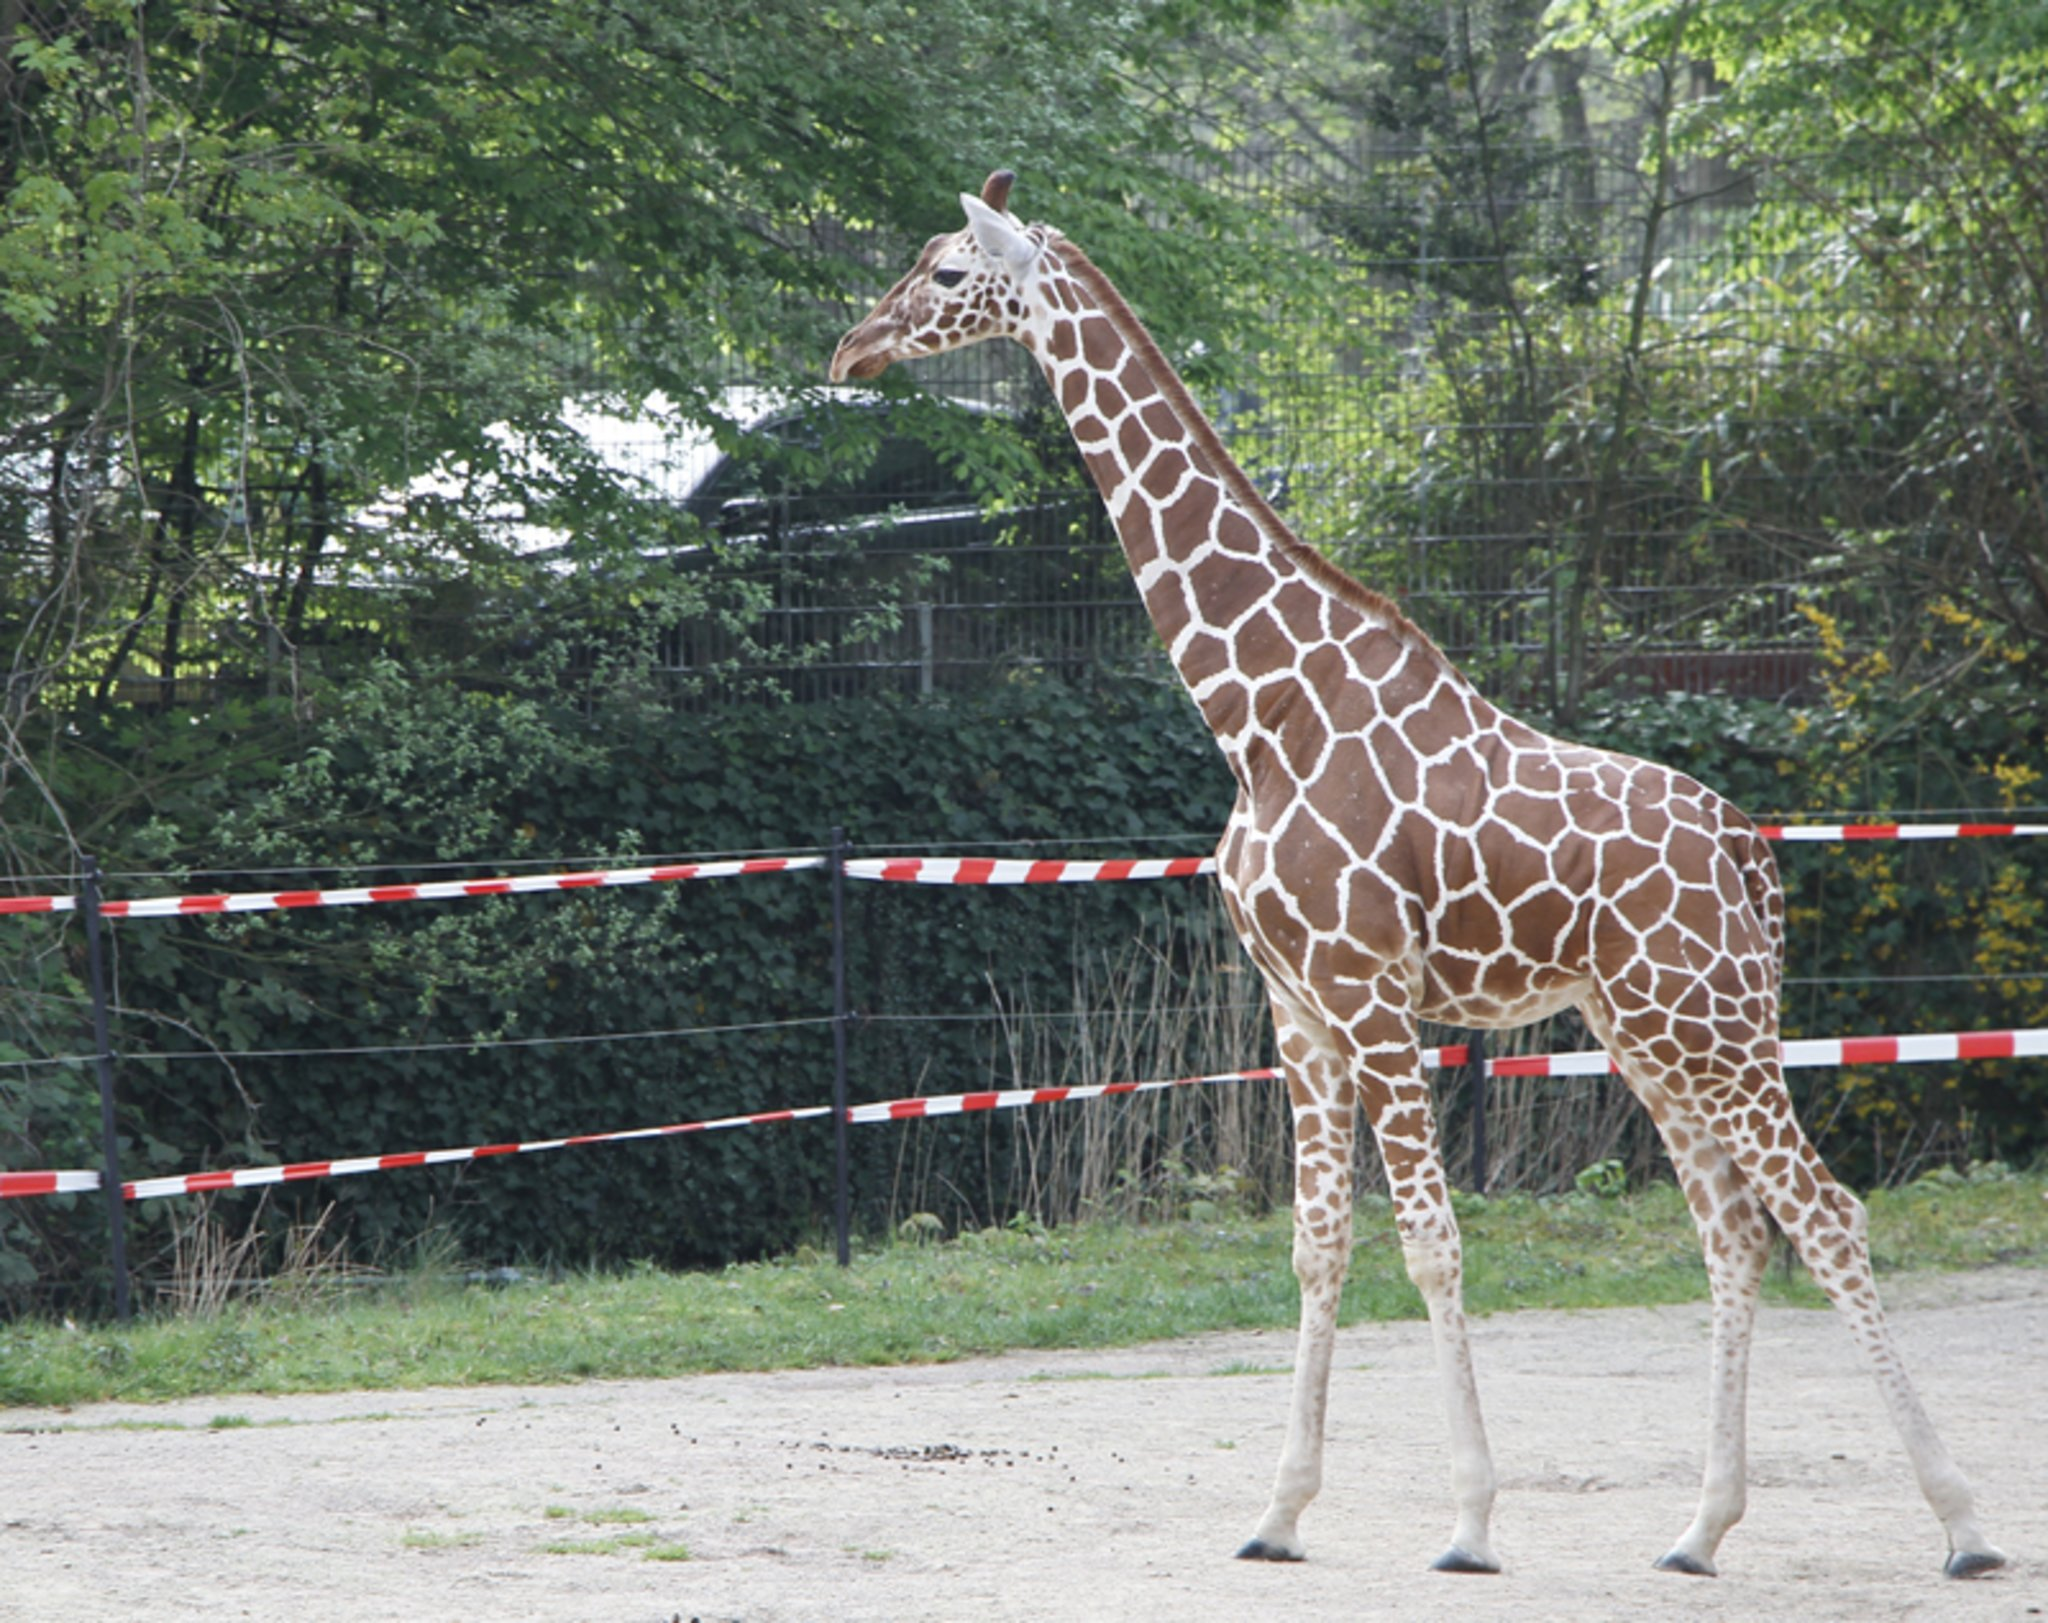 Kölner Zoo Patenschaft